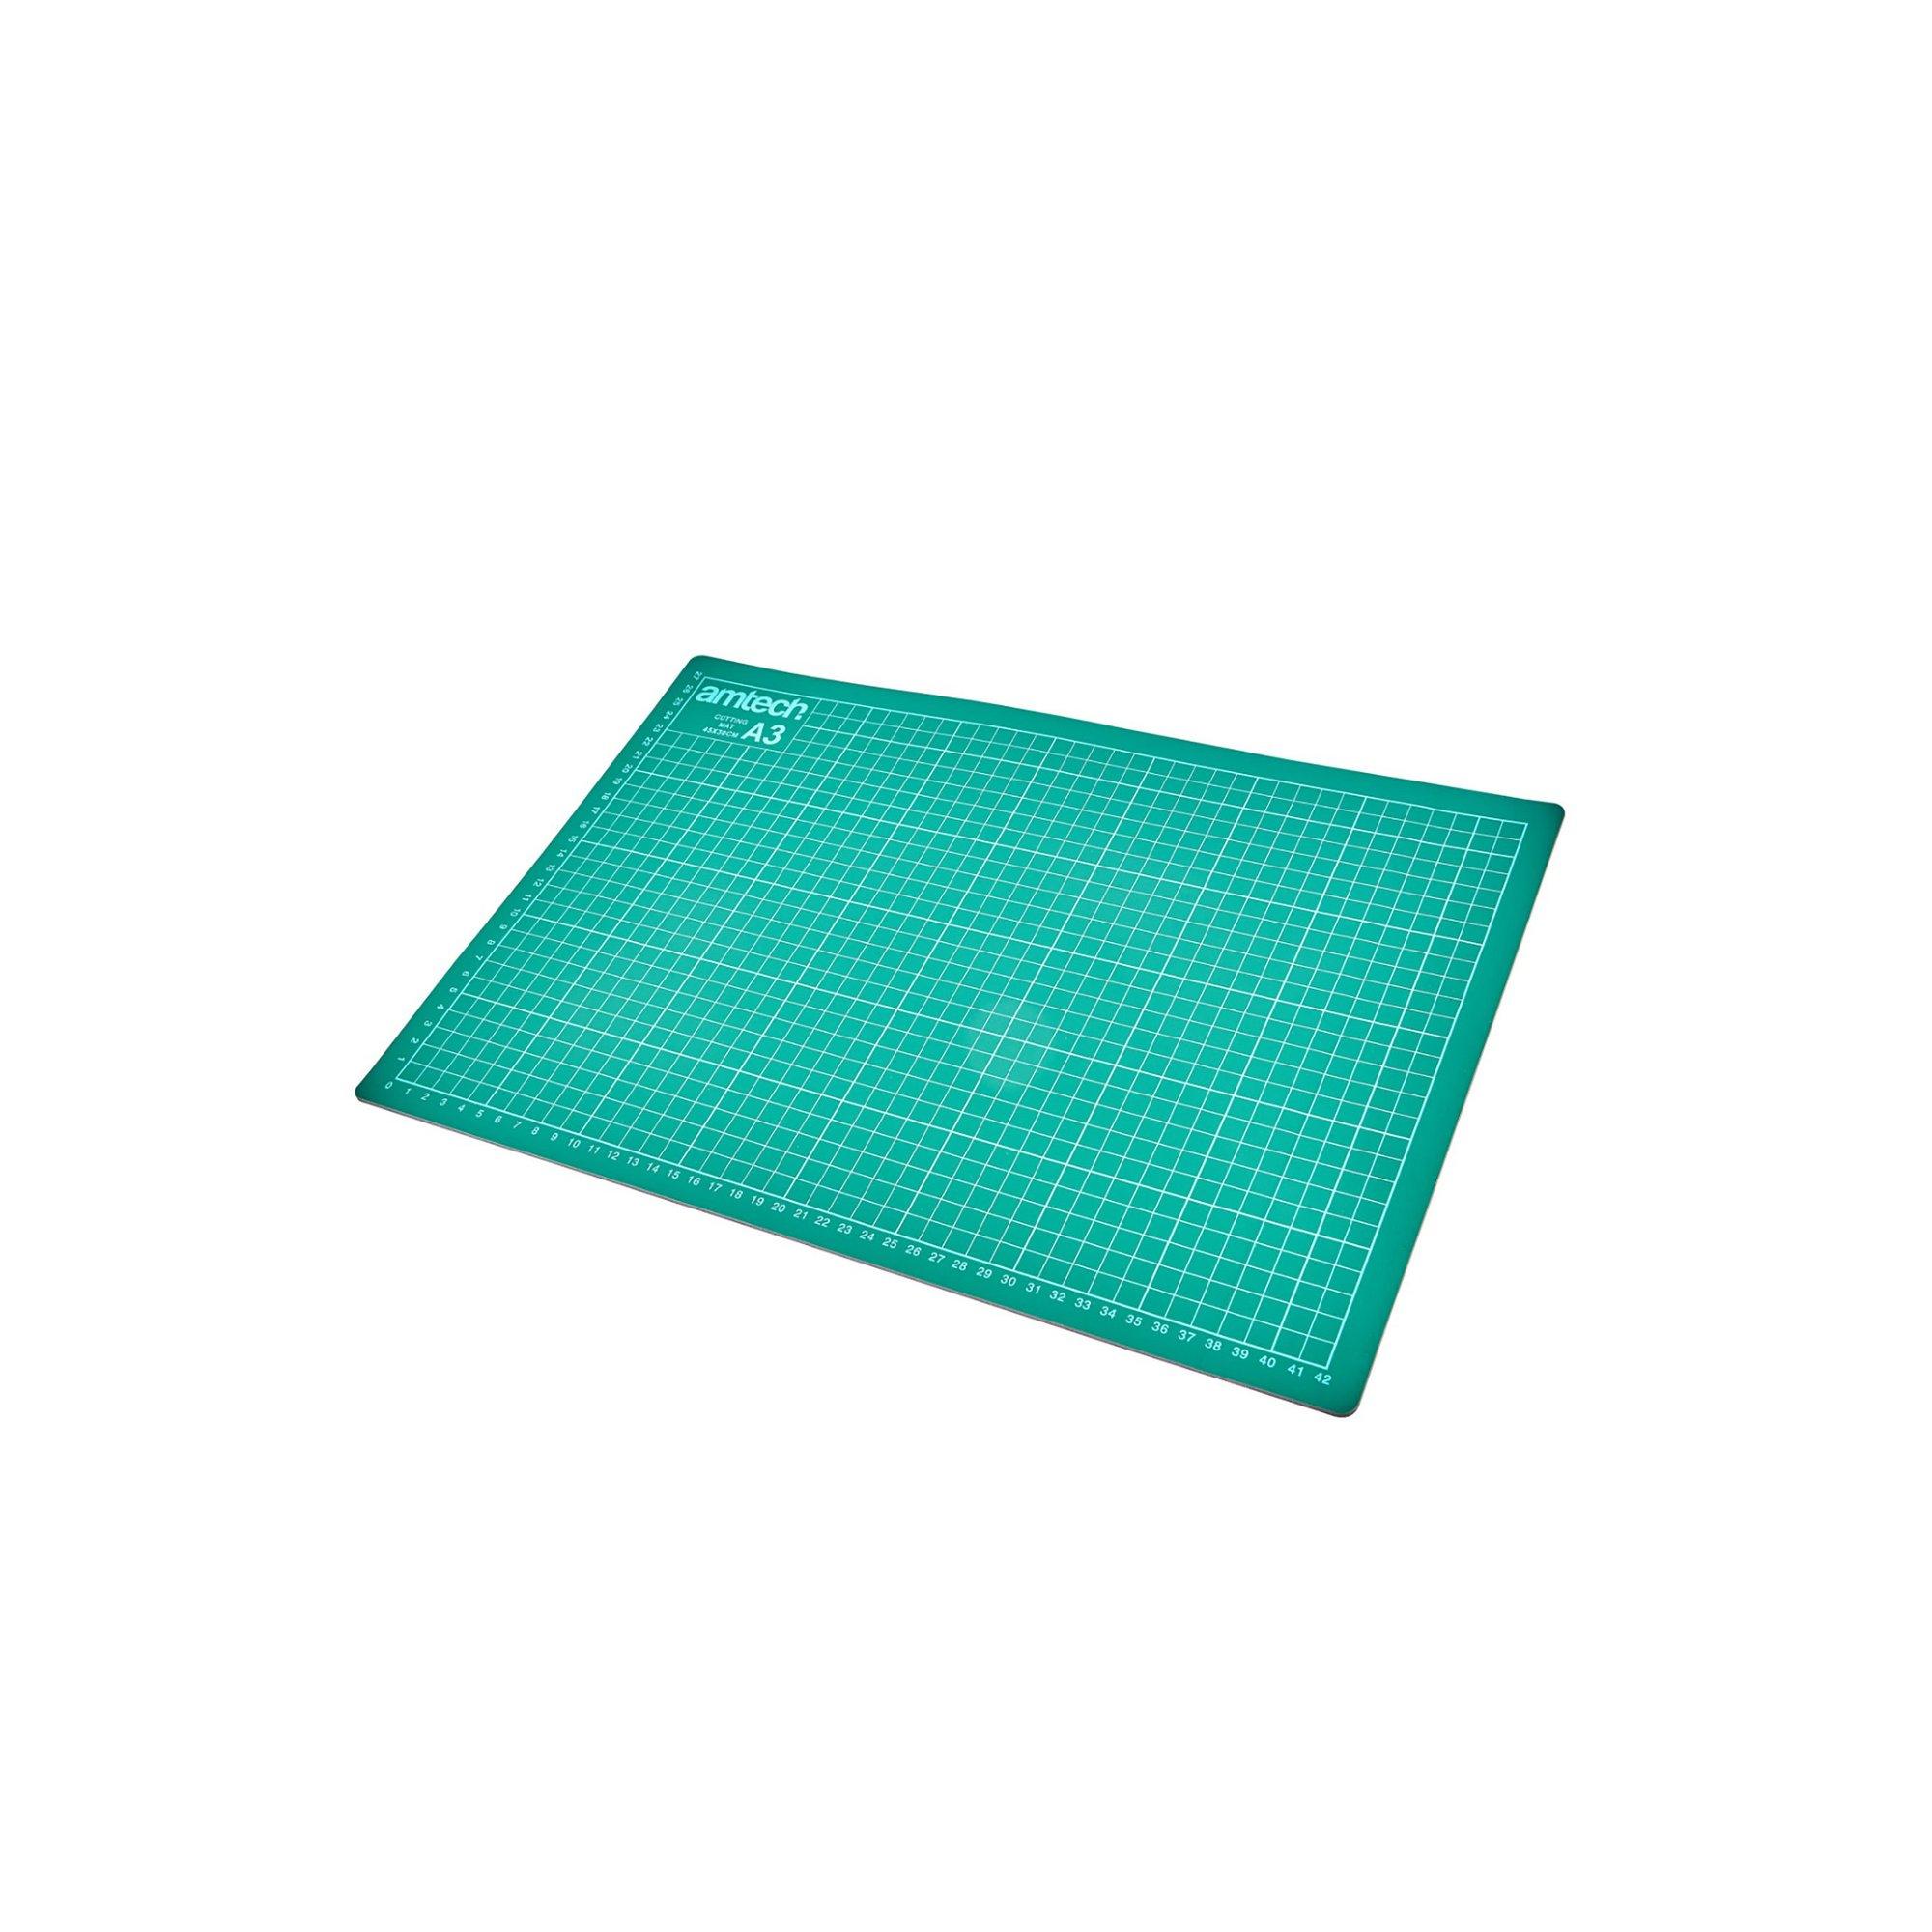 Image of A3 Cutting Mat